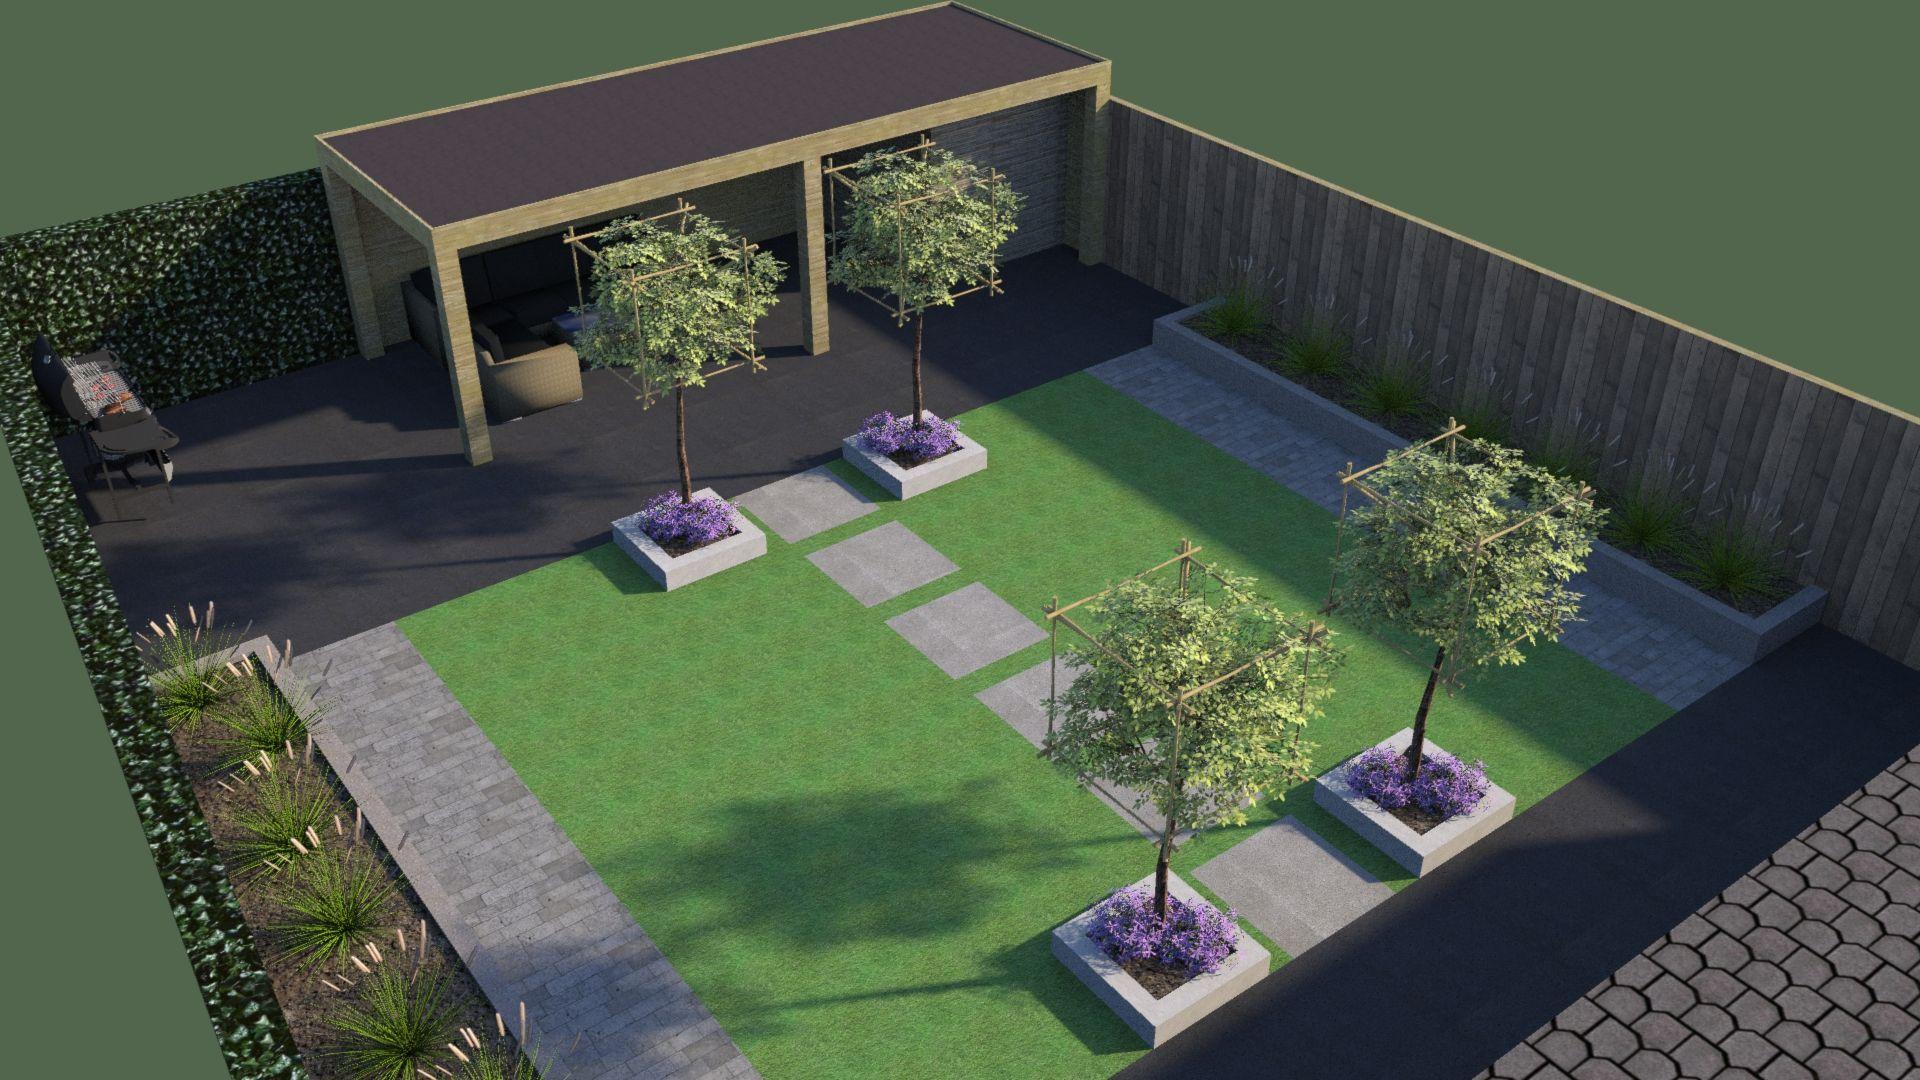 Tuin ontwerp culemborg jversteegh kert pinterest for Ontwerp tuin